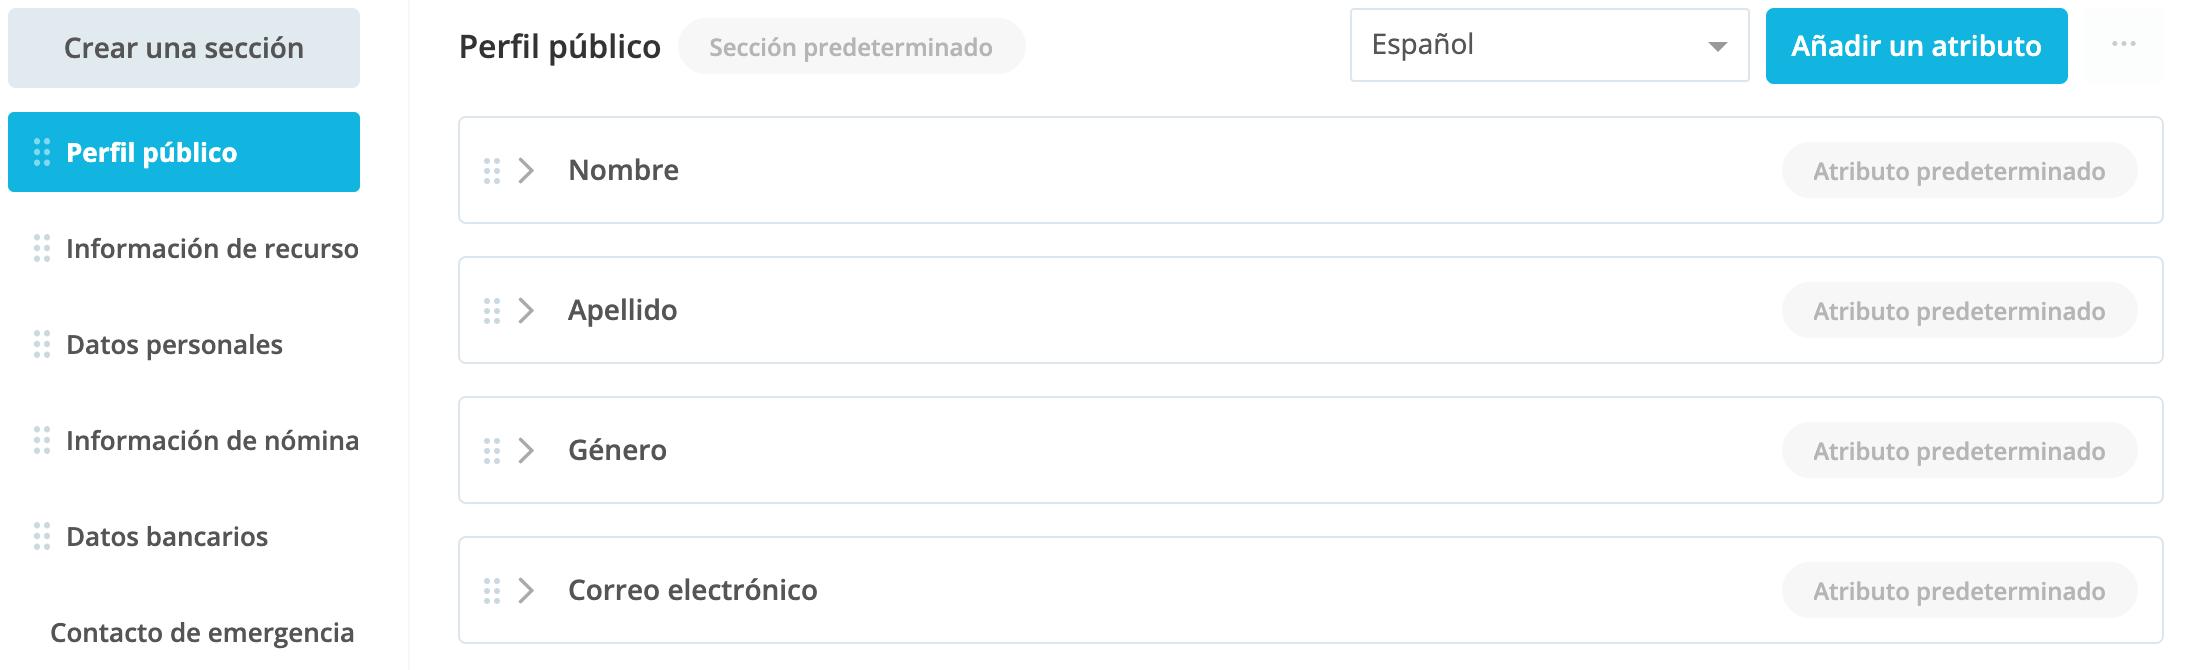 important-preset-attributes-public-profile_es.png